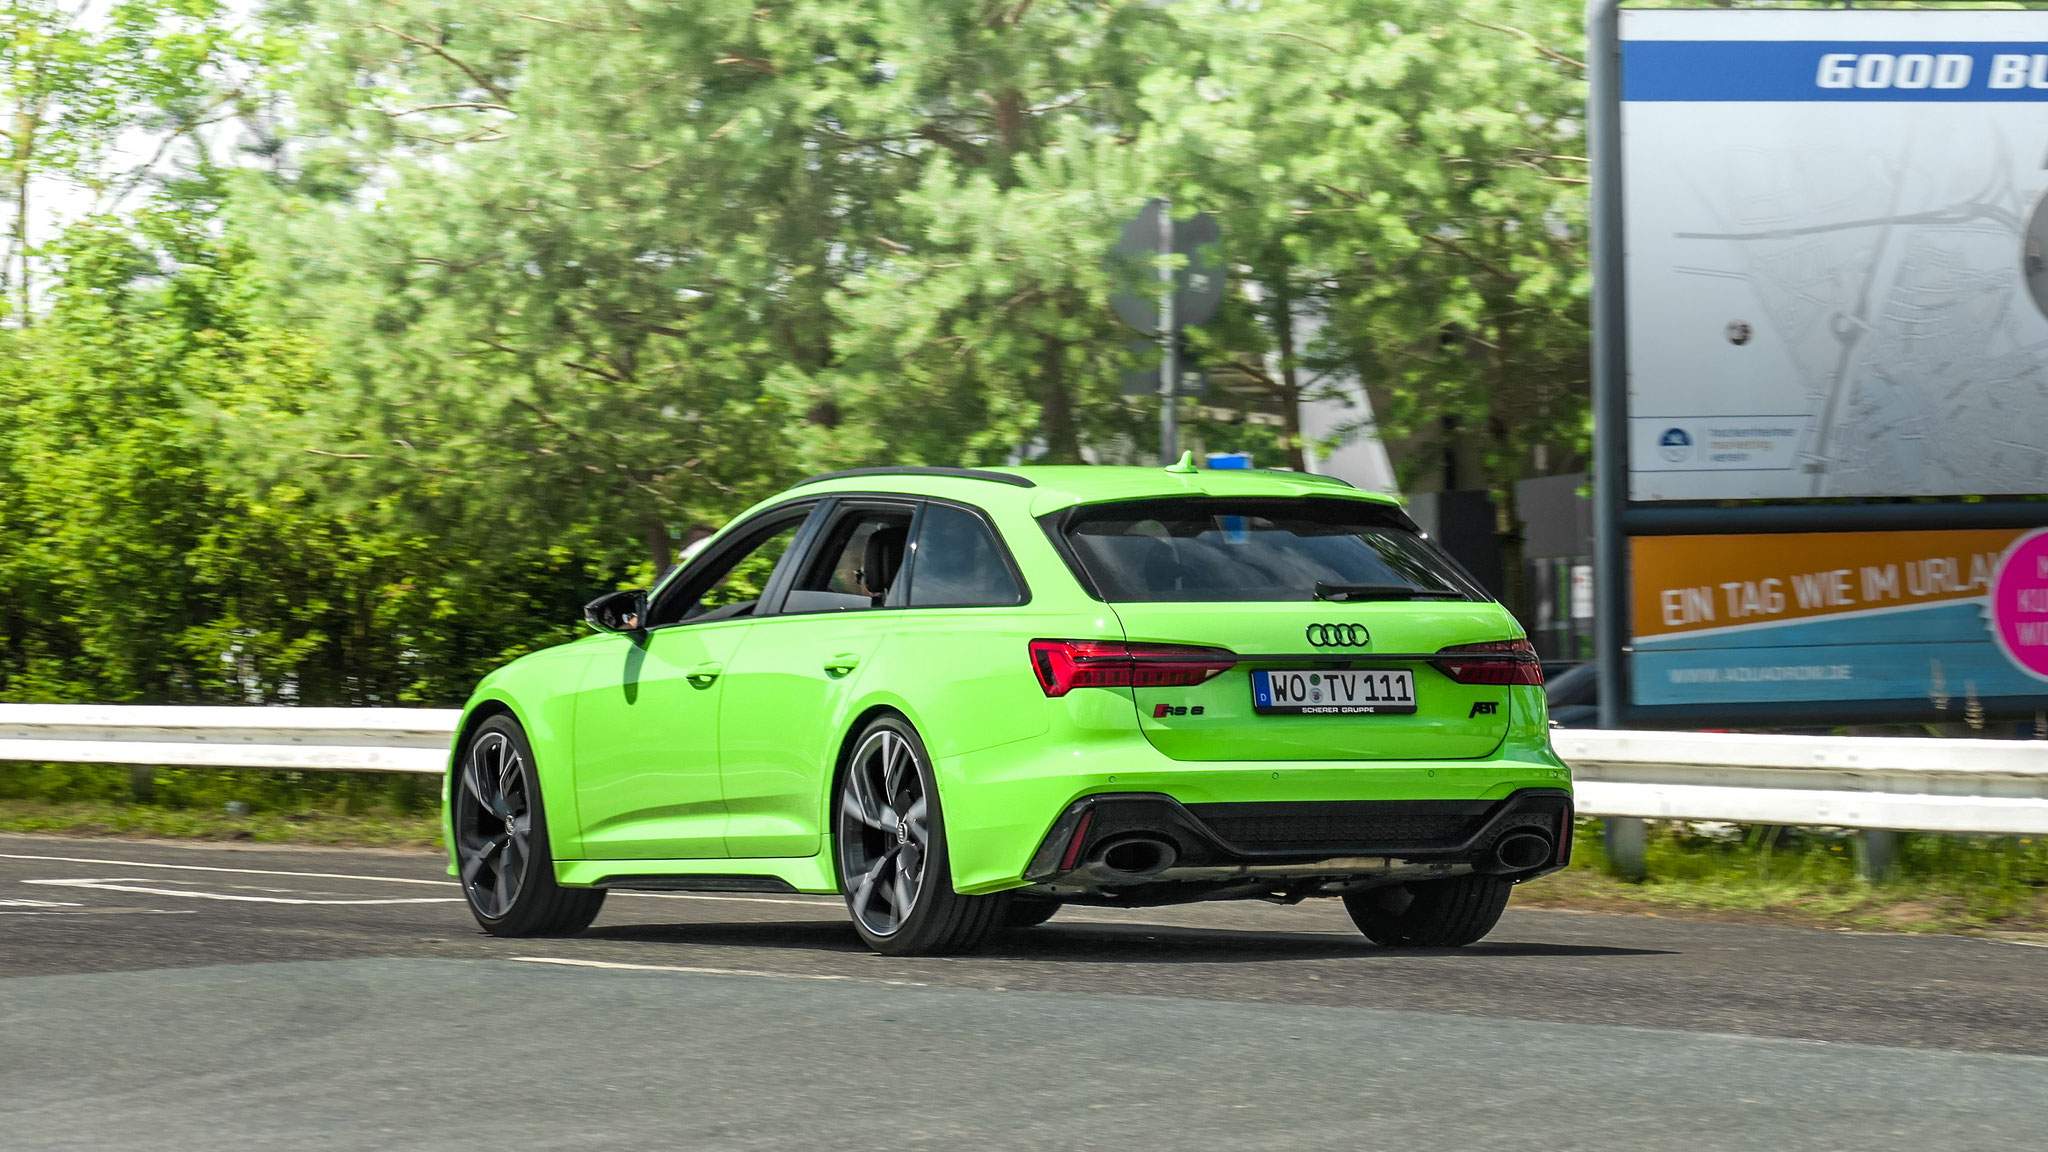 Audi RS6 ABT - WO-TV-111